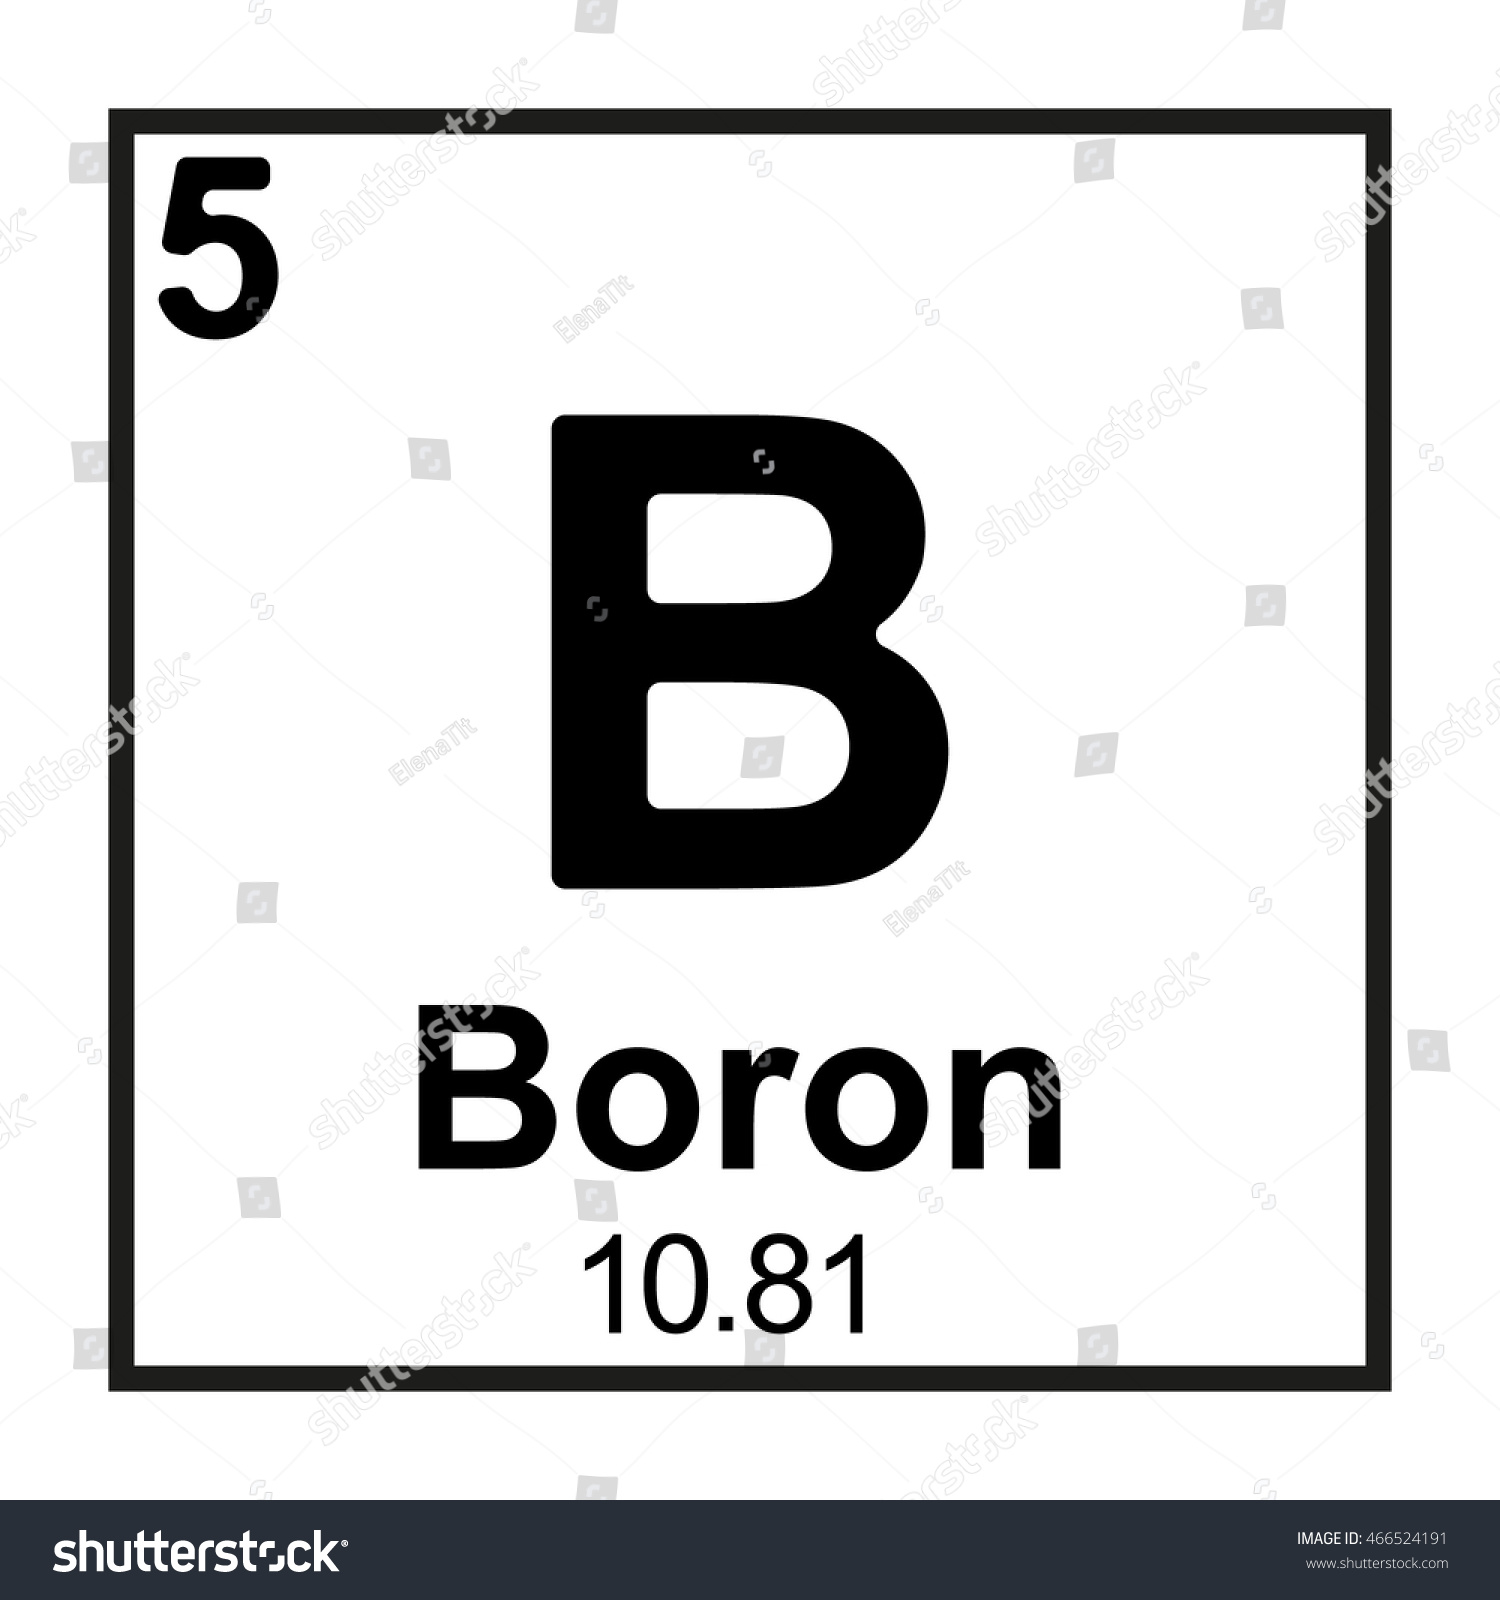 Periodic table element boron stock vector 466524191 shutterstock the periodic table element boron gamestrikefo Choice Image